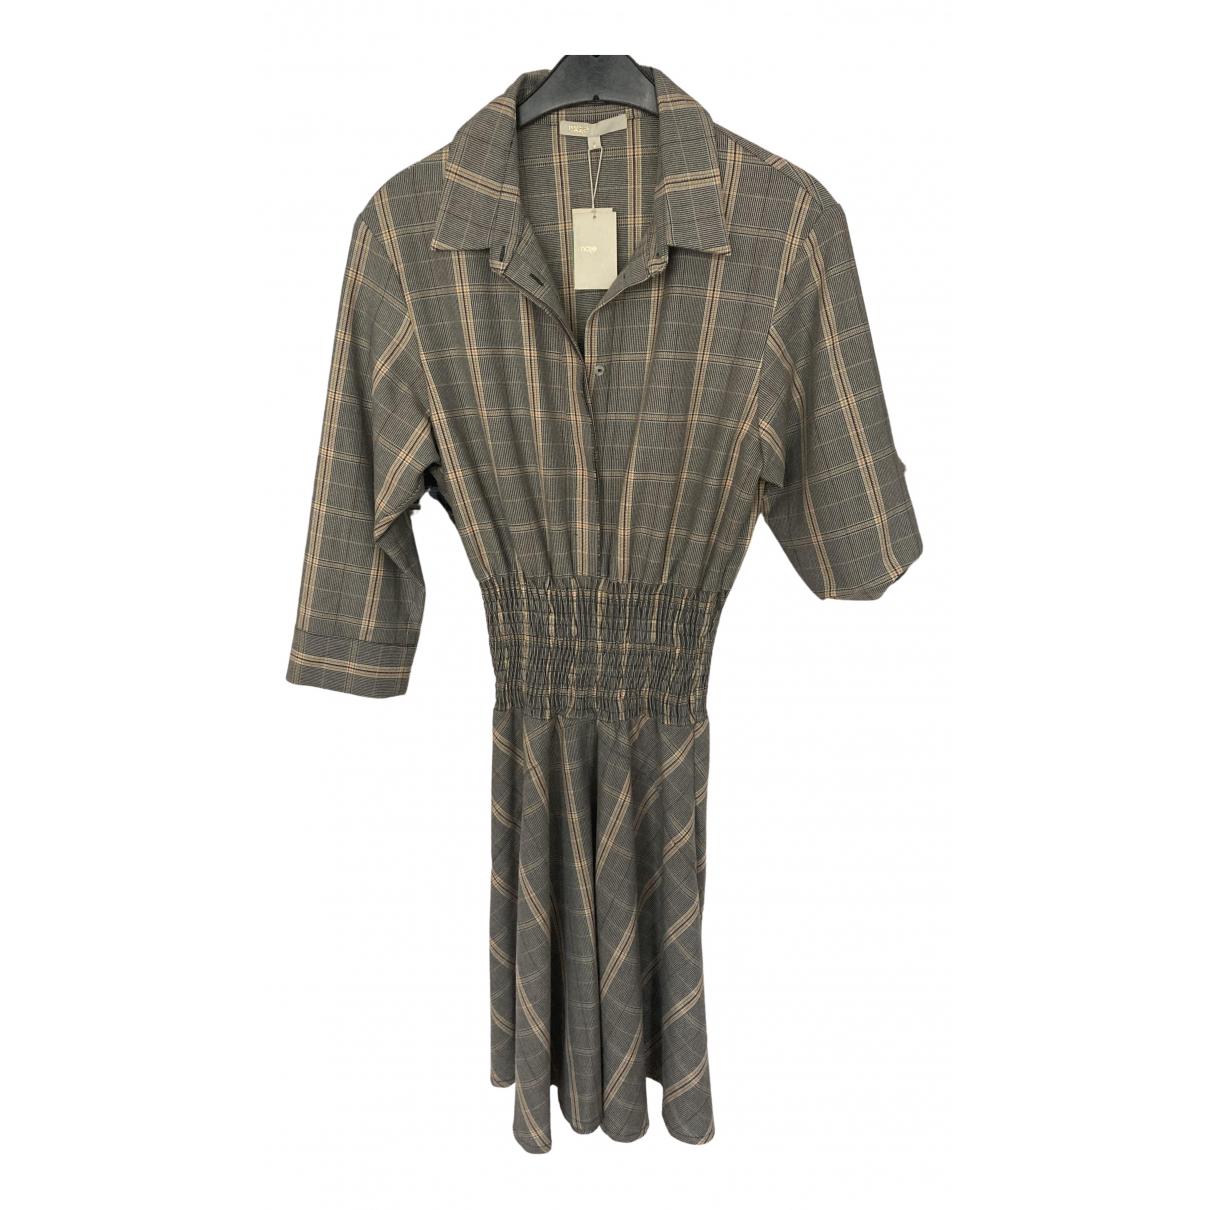 Maje - Robe Spring Summer 2020 pour femme - gris